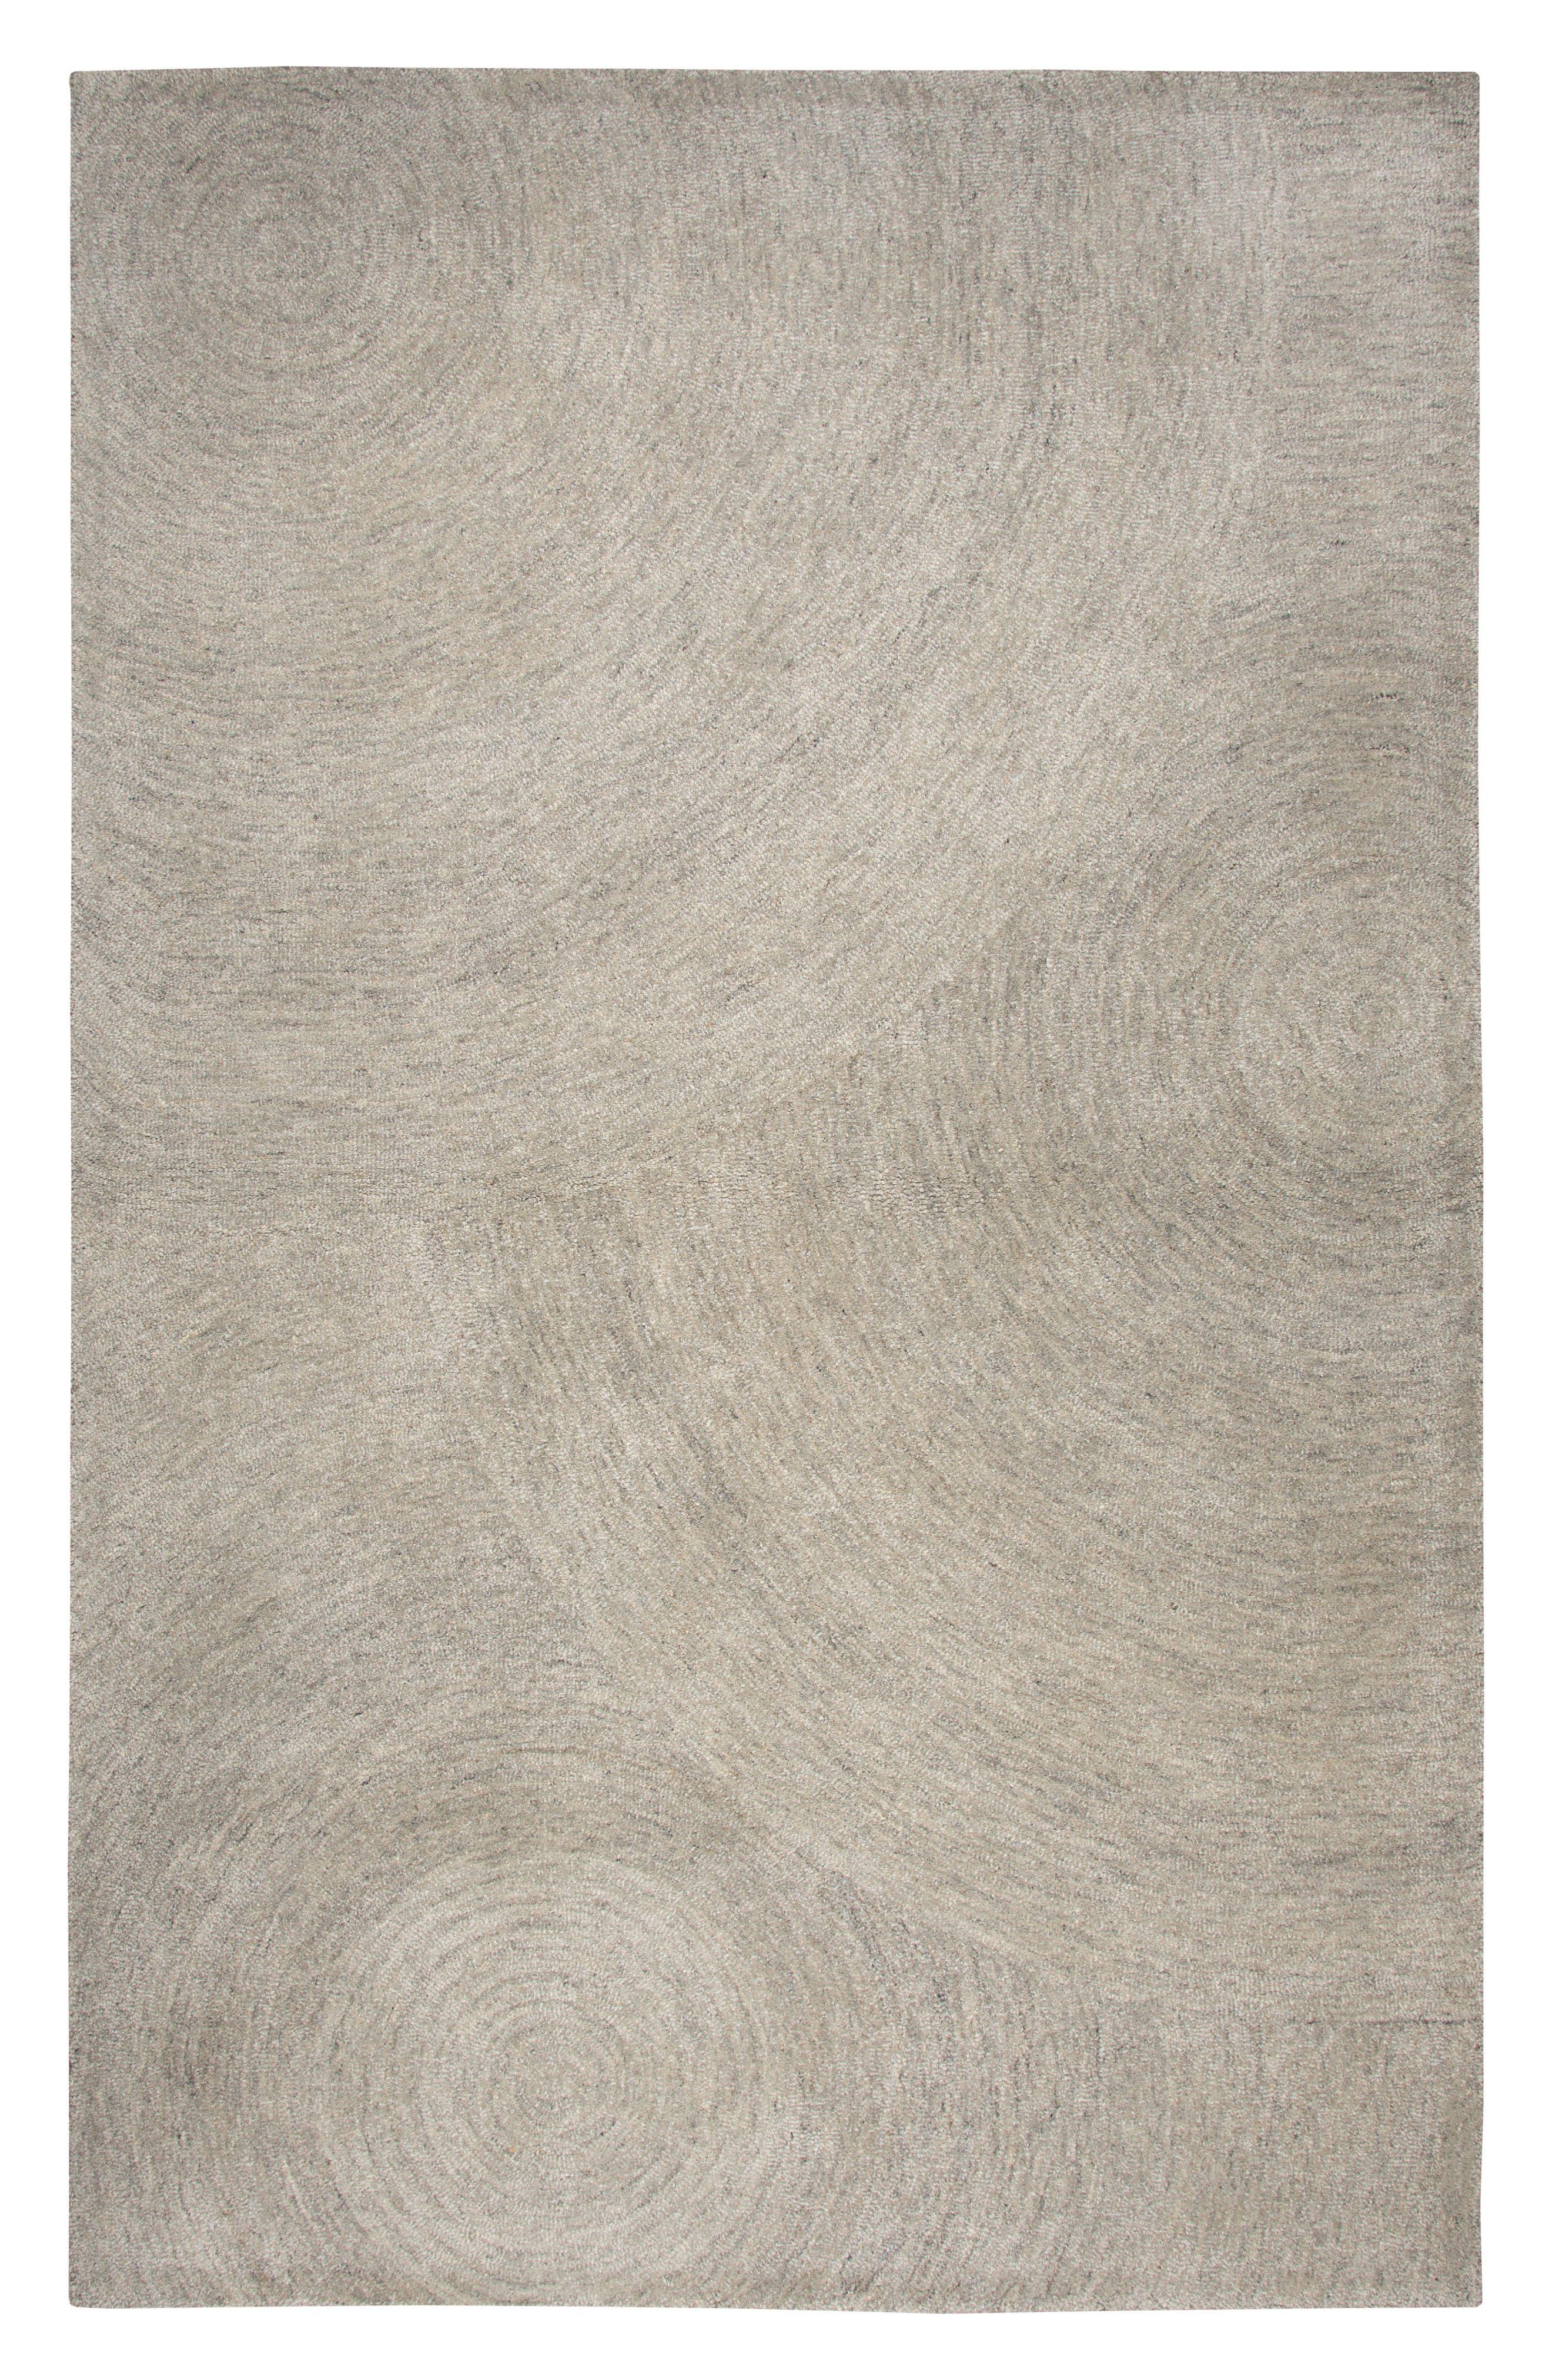 Brindleton Collection Swirl Rug,                         Main,                         color, 020